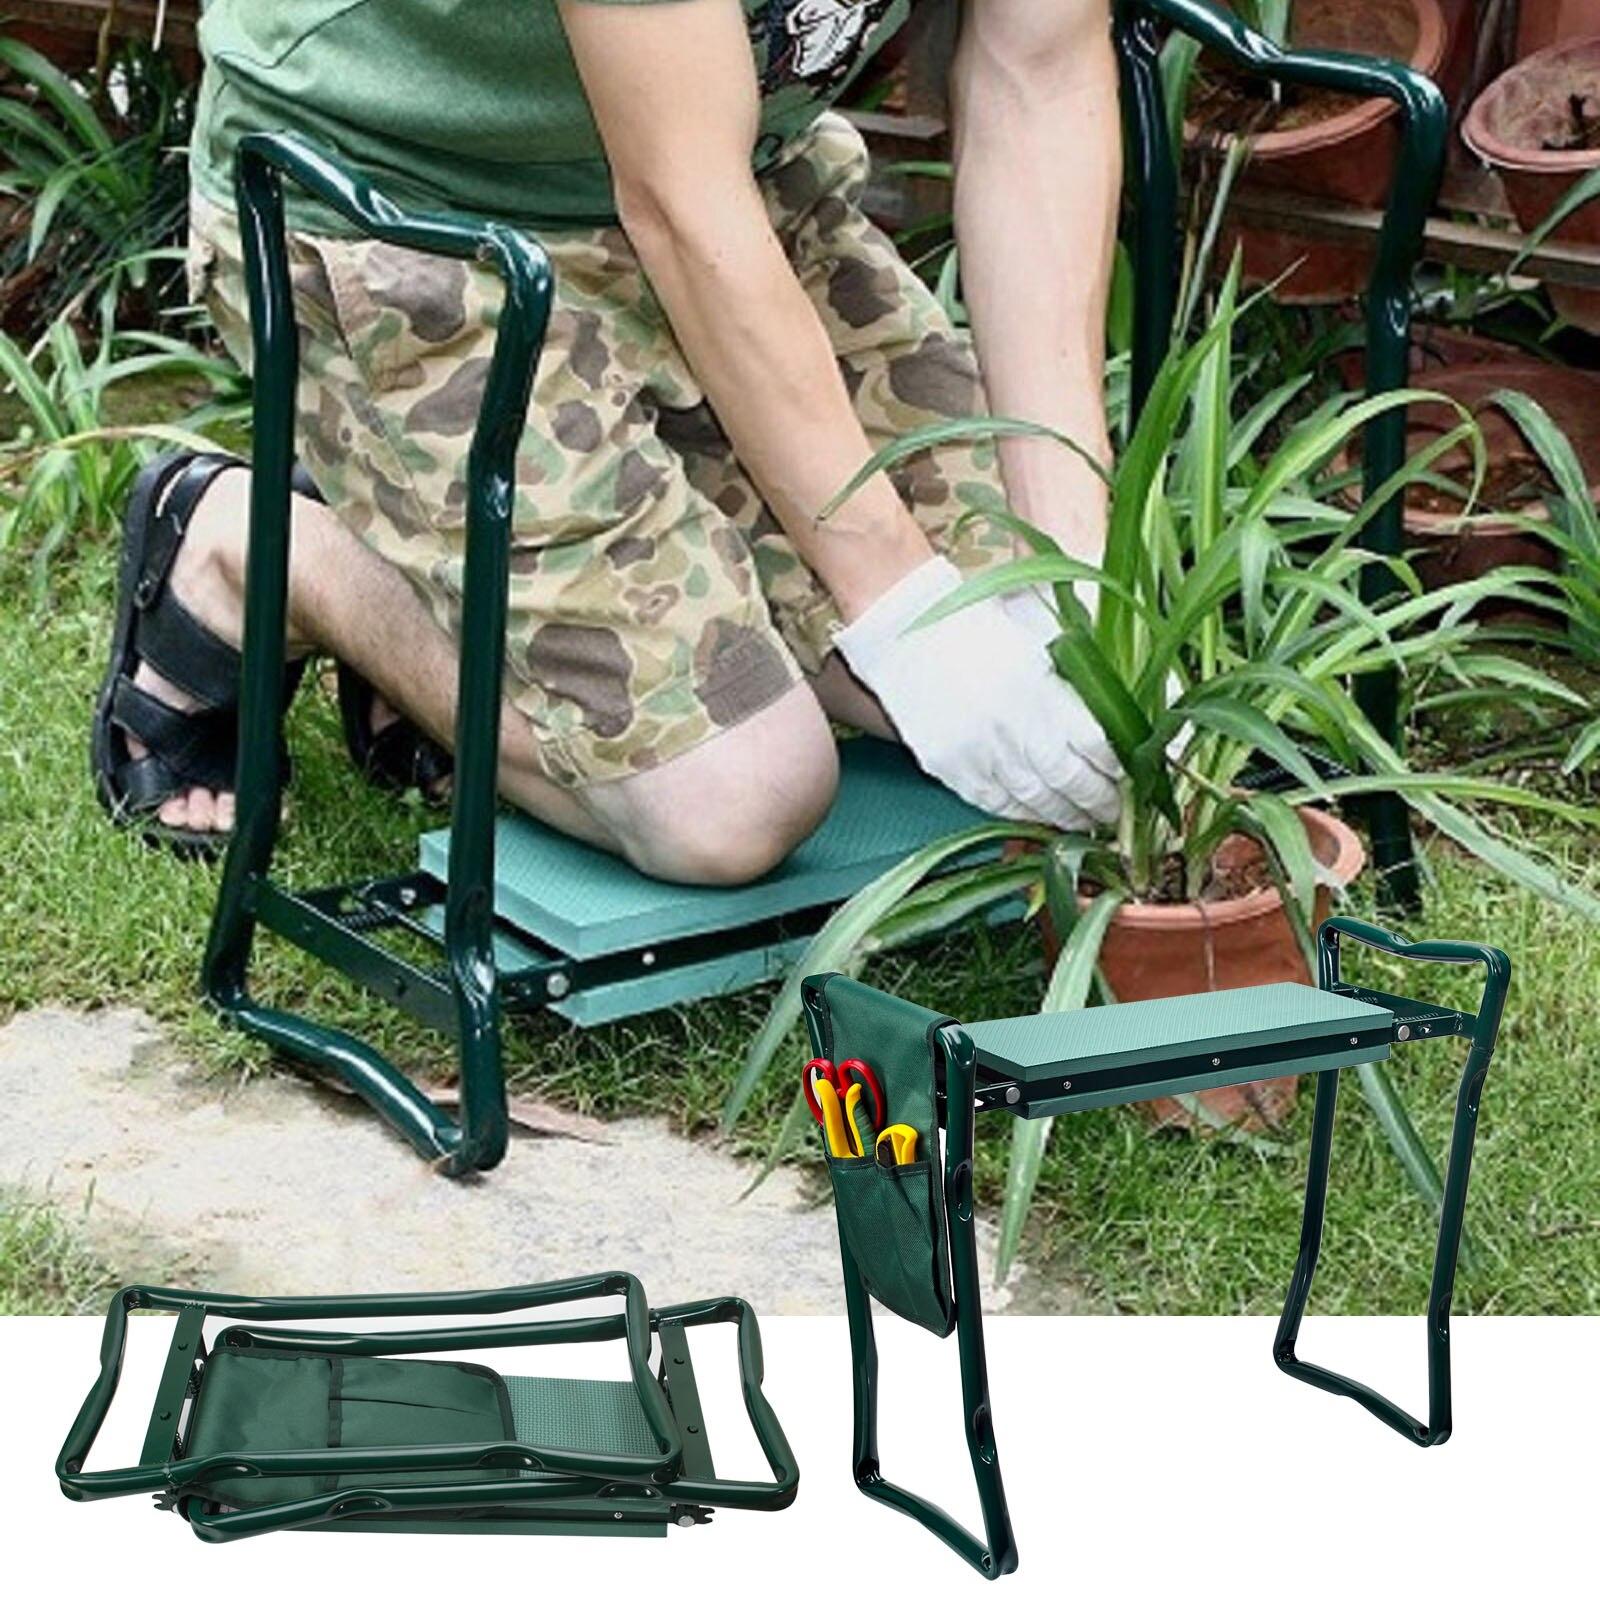 Folding Garden Chair Kneeler Seat Stainless Steel Garden Stool with EVA Kneeling Pad Bearing 150KG